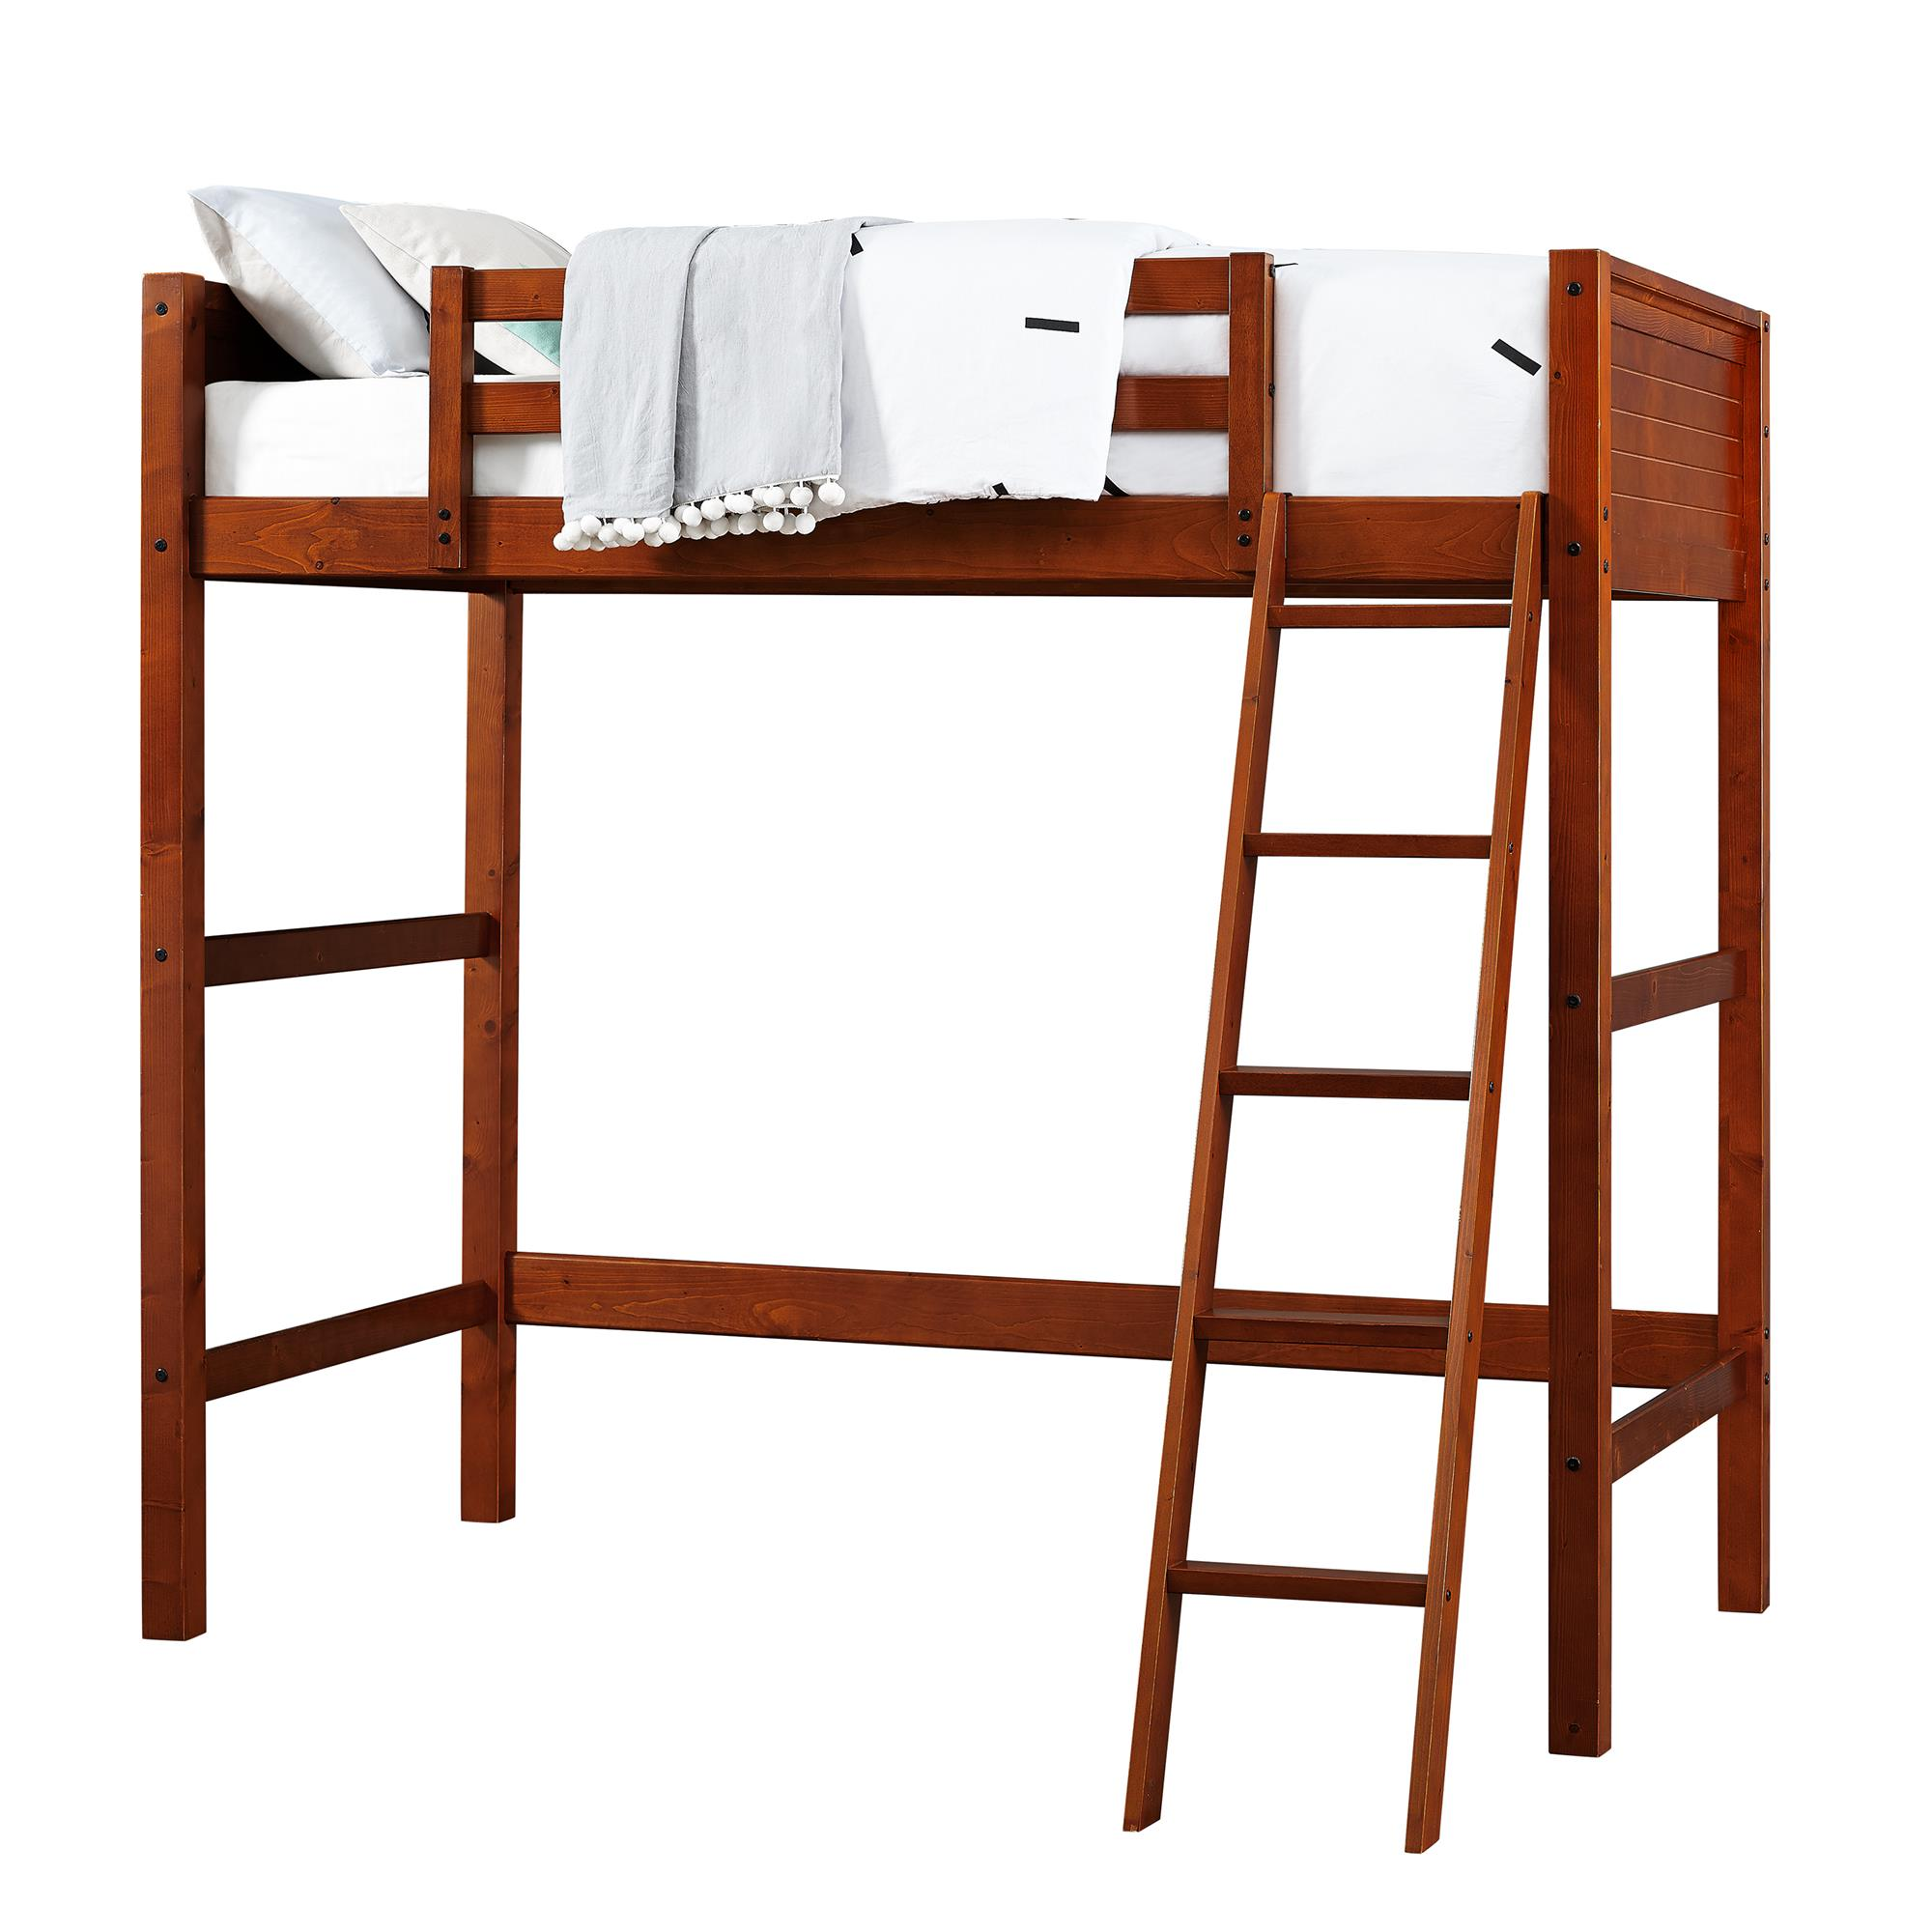 Twin Wood Loft Bed Furniture Ladder Home Storage Rails